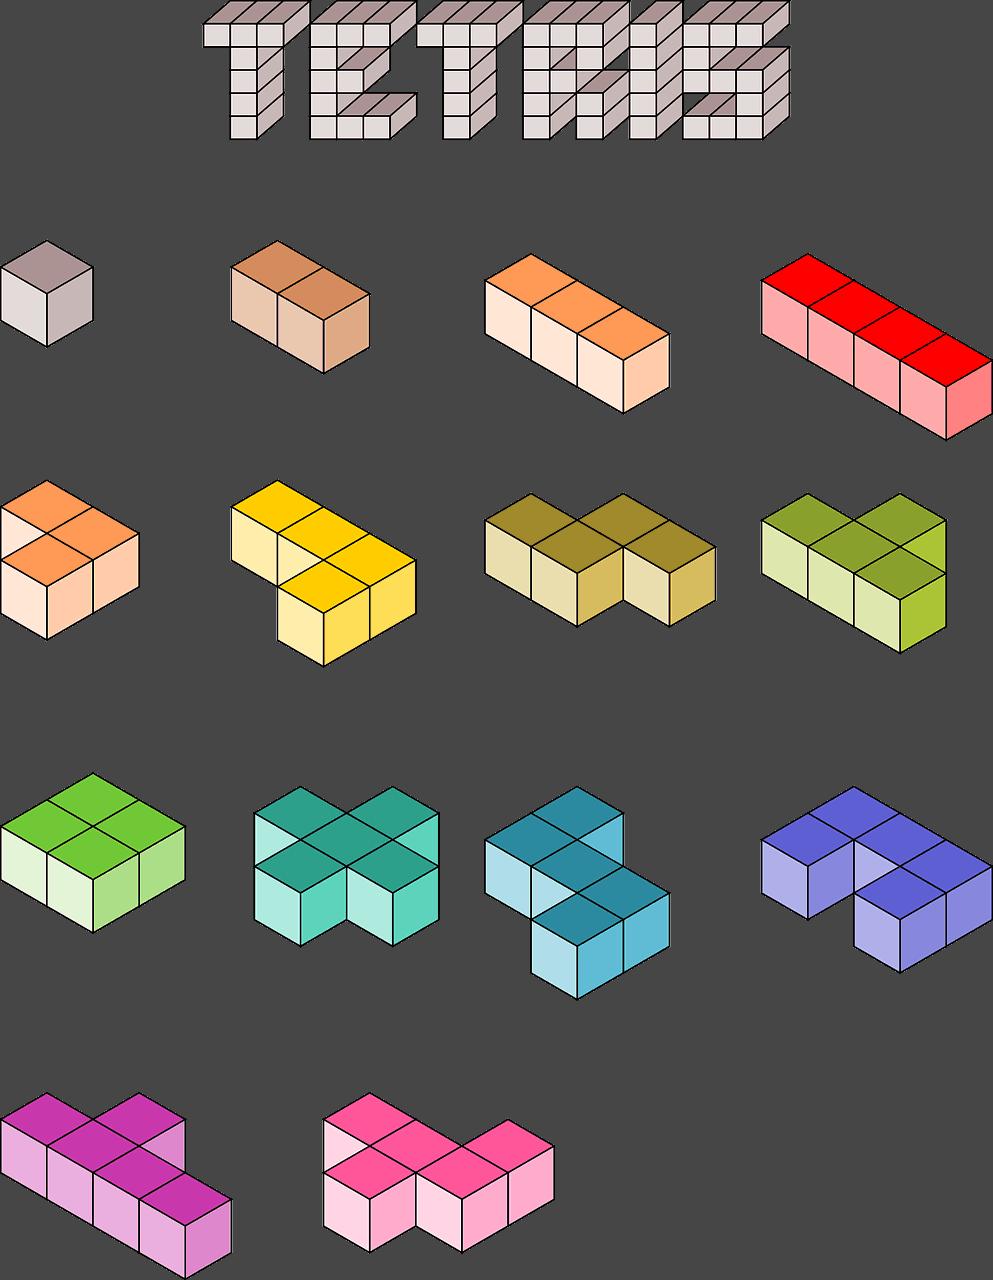 Tetris 35th anniversary